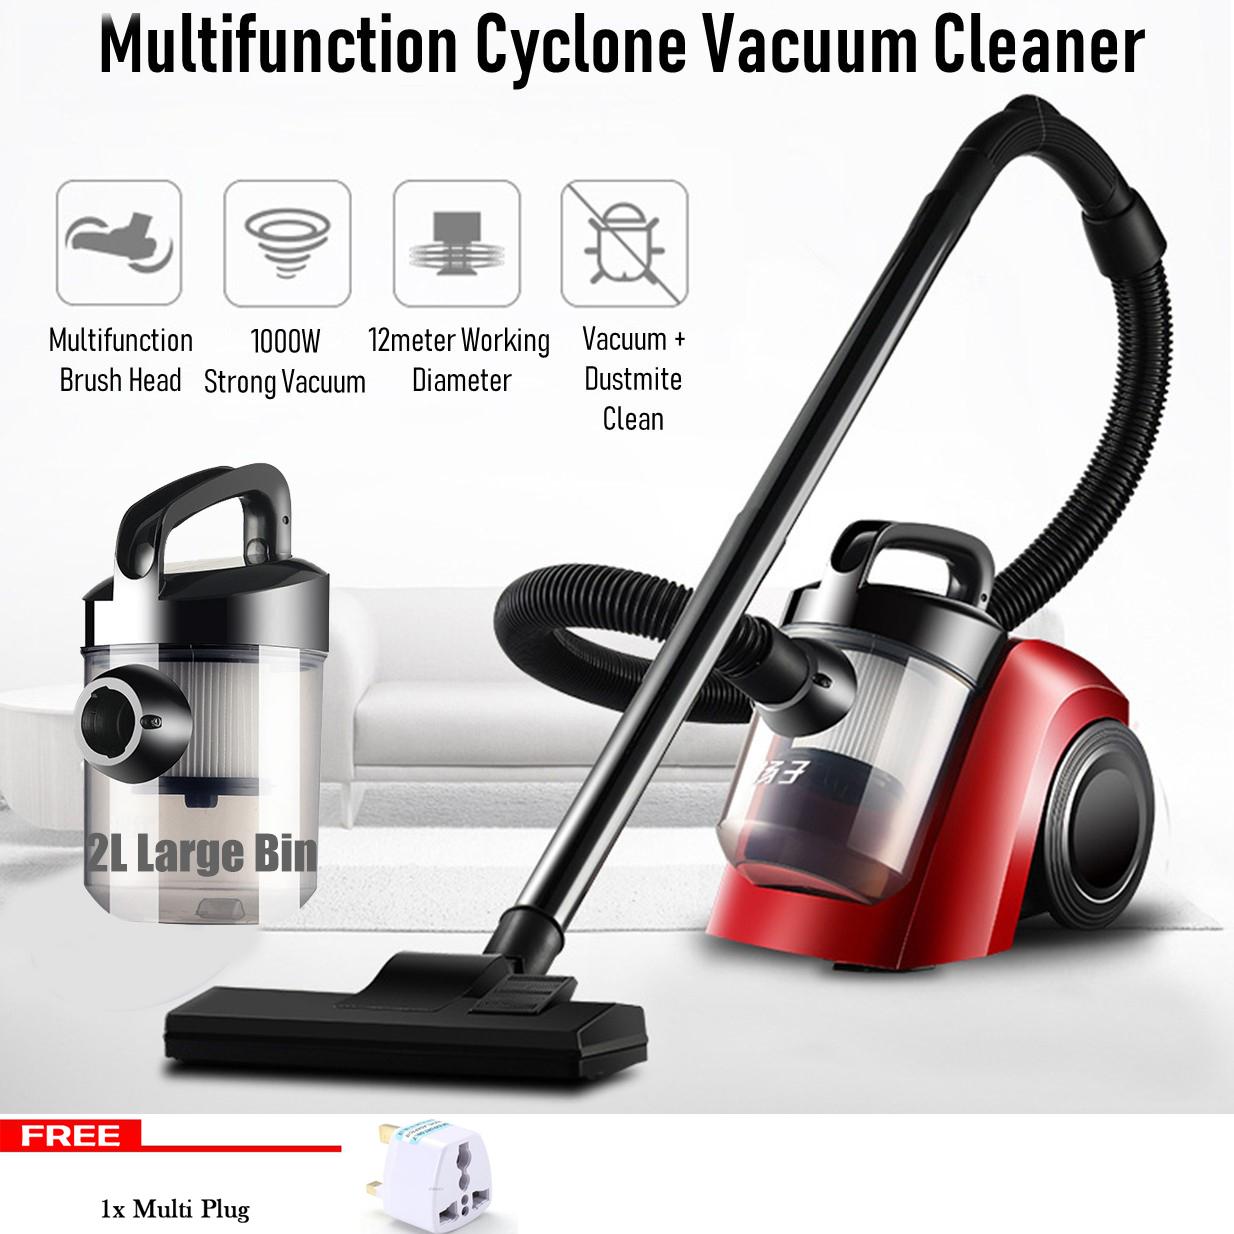 1000W  Cyclone Vacuum Cleaner High Power Dust Acarid Dust-Mite Cleaner